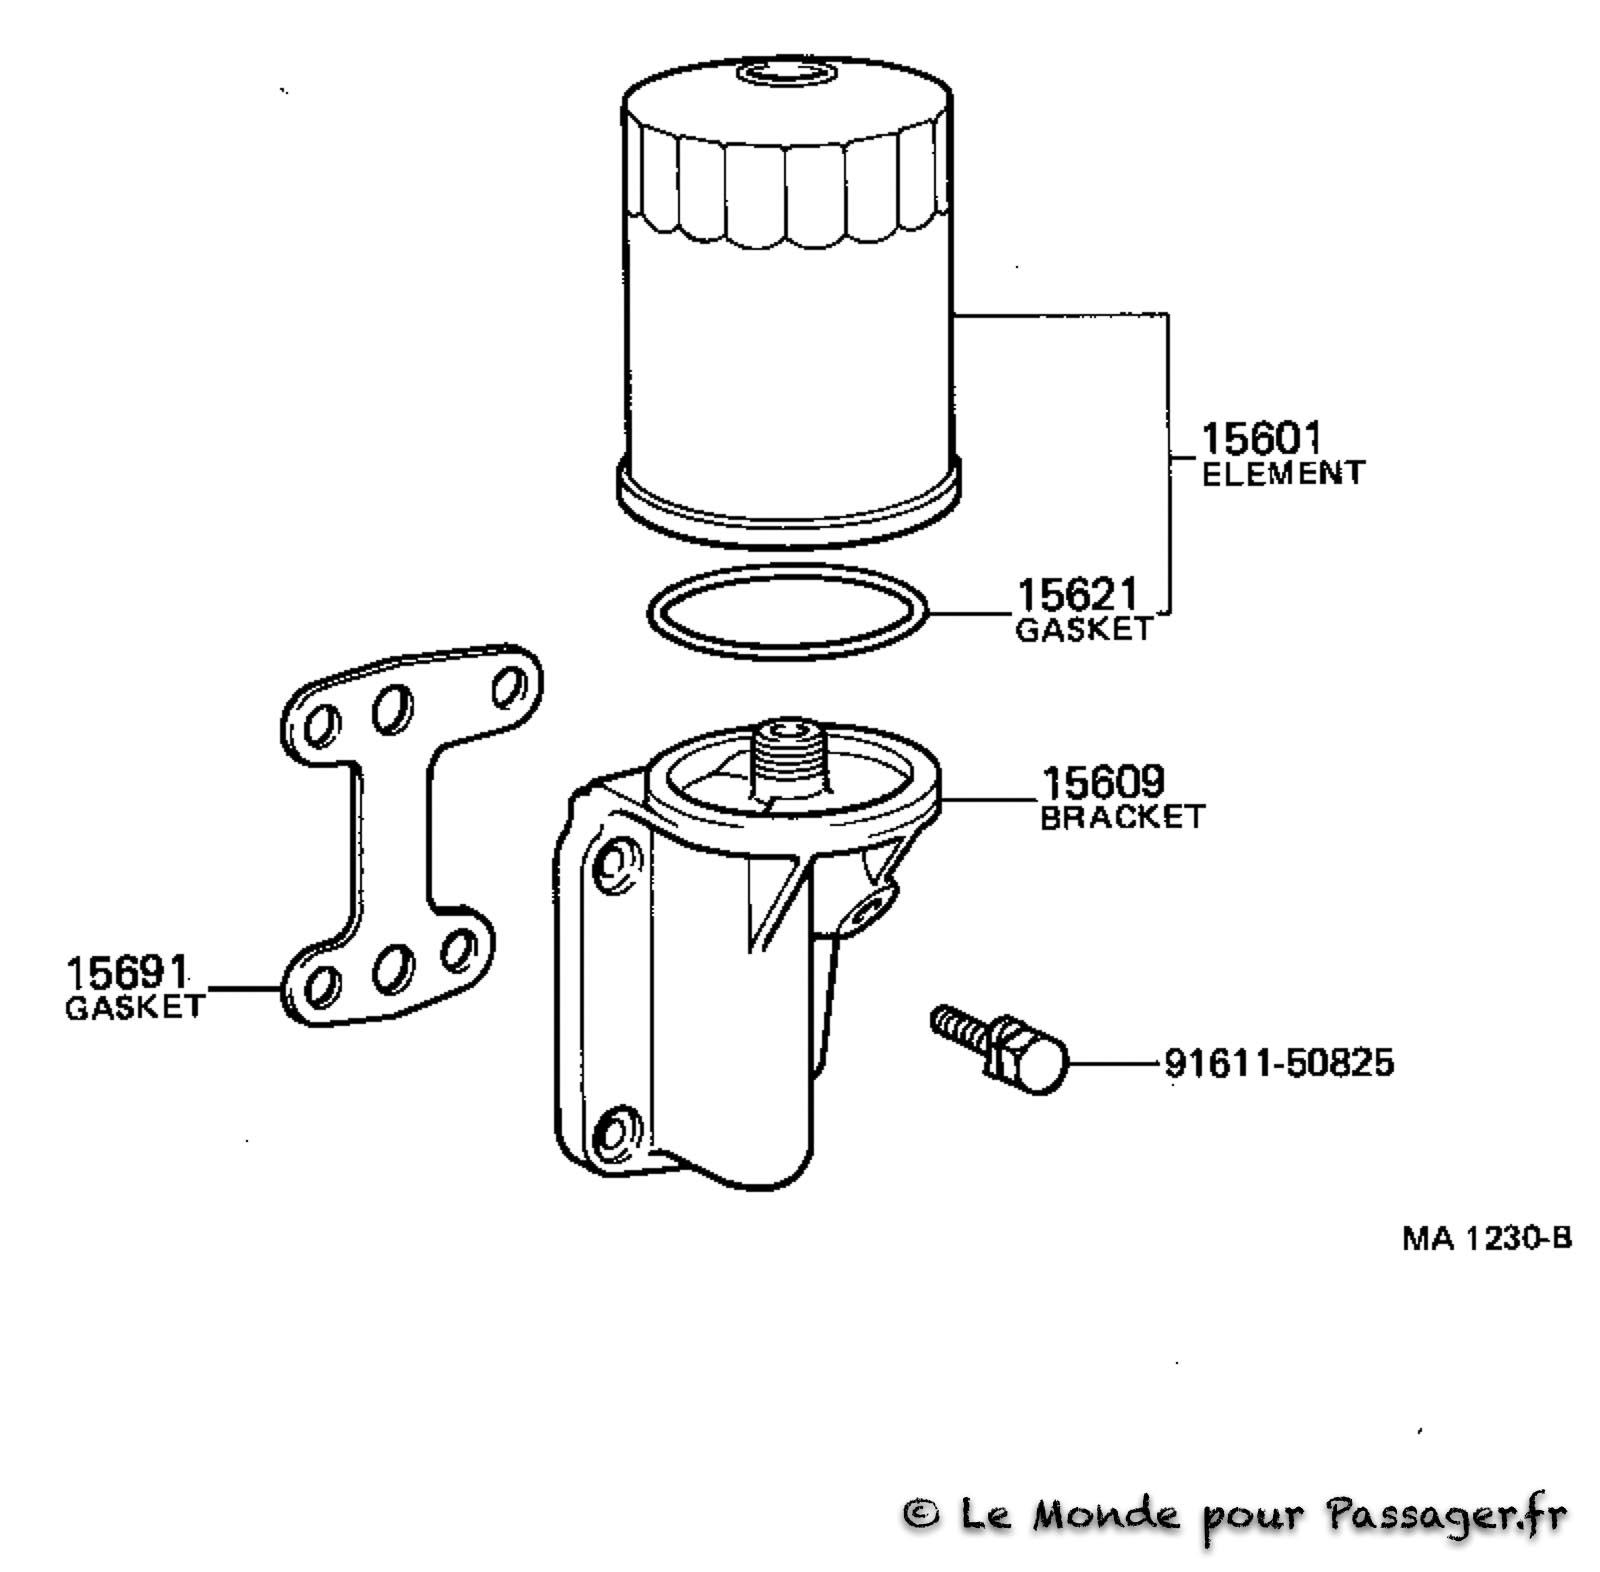 Fj55-Eclatés-Techniques012